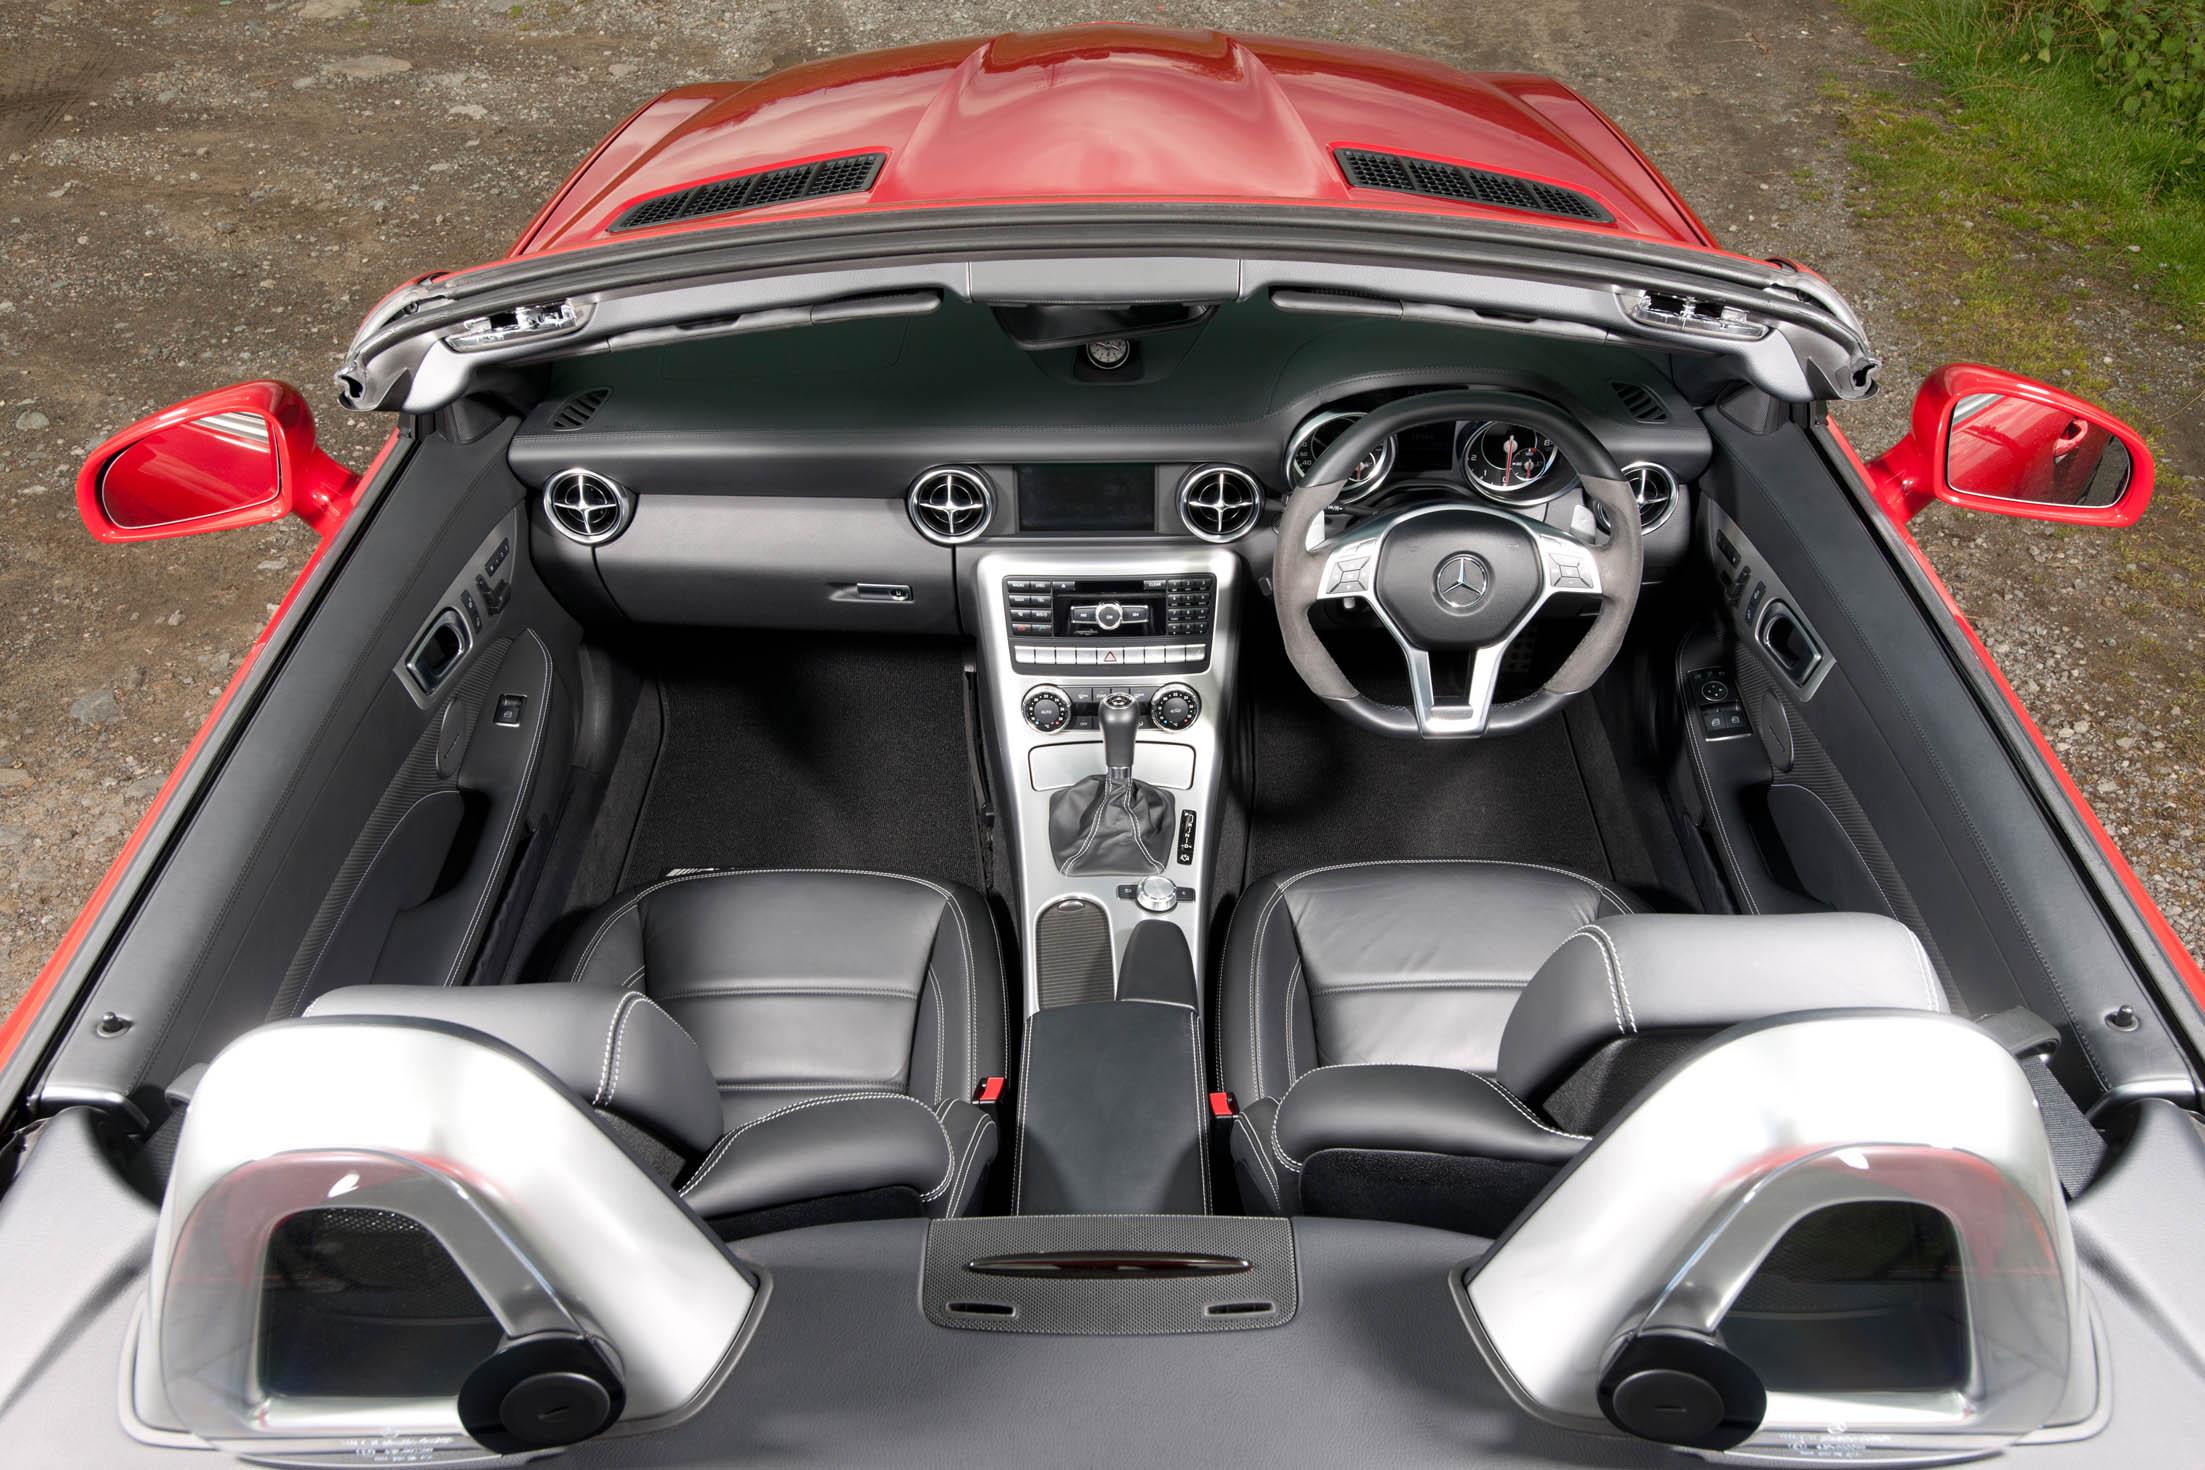 Mercedes Slk Seat Covers Uk